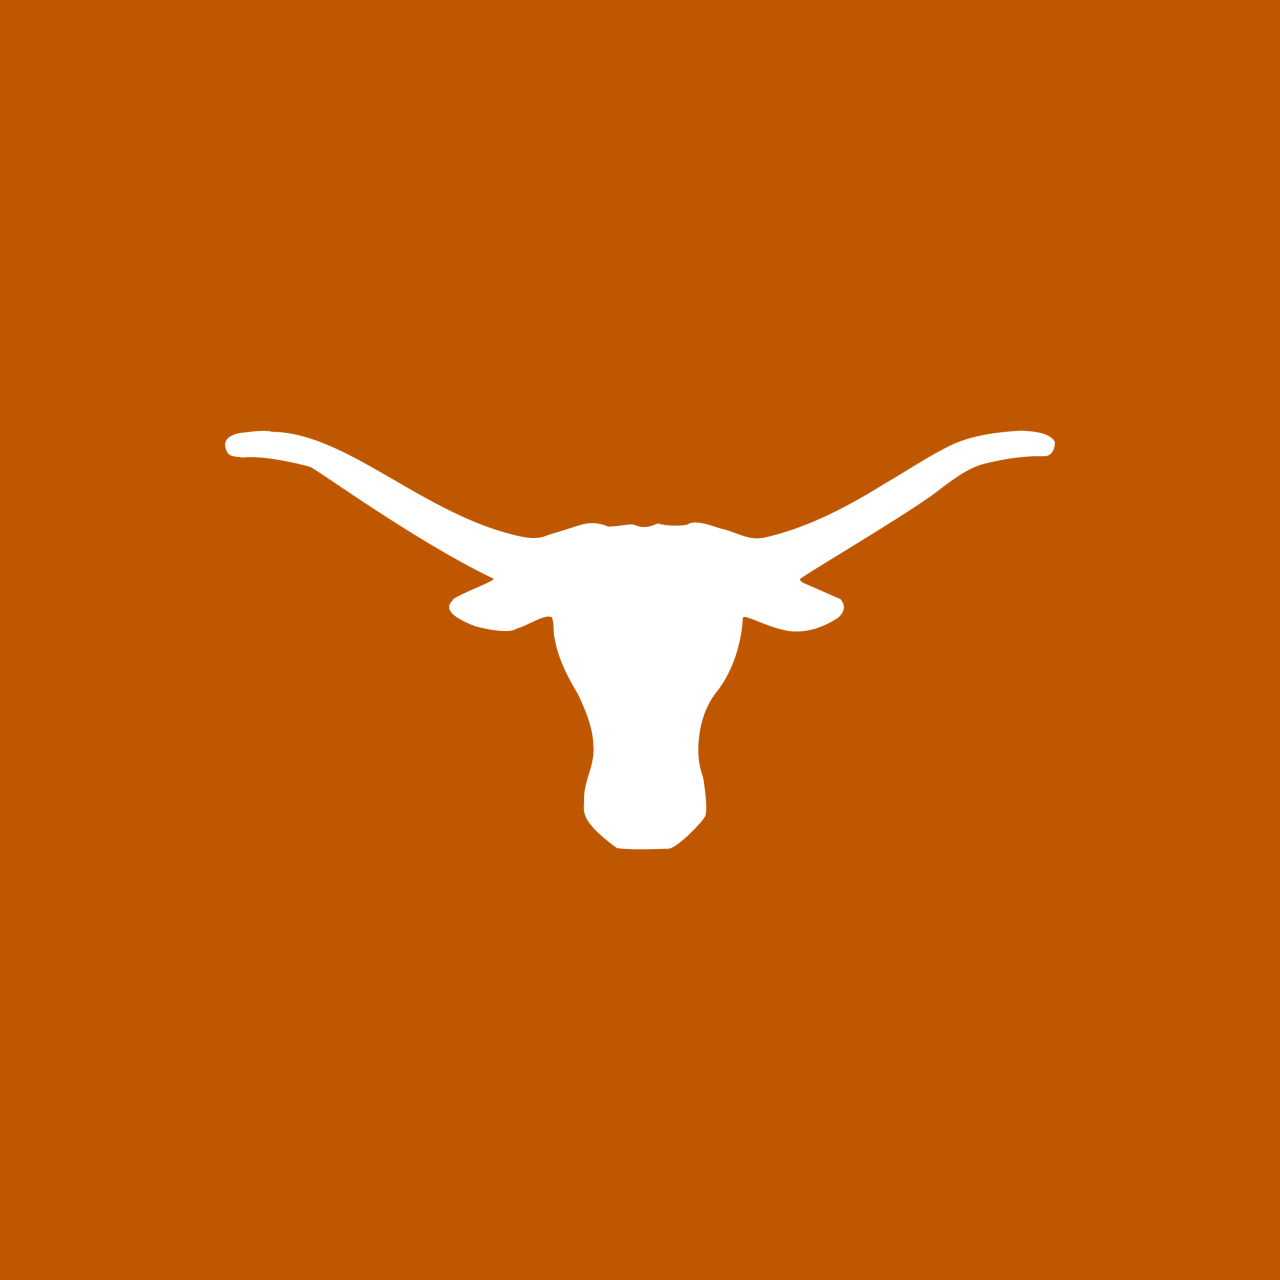 Texas Longhorns Ncaa Designer William Rooster Andrews Firm N A Year 1961 Longhorns Football Texas Longhorns Football Texas Logo